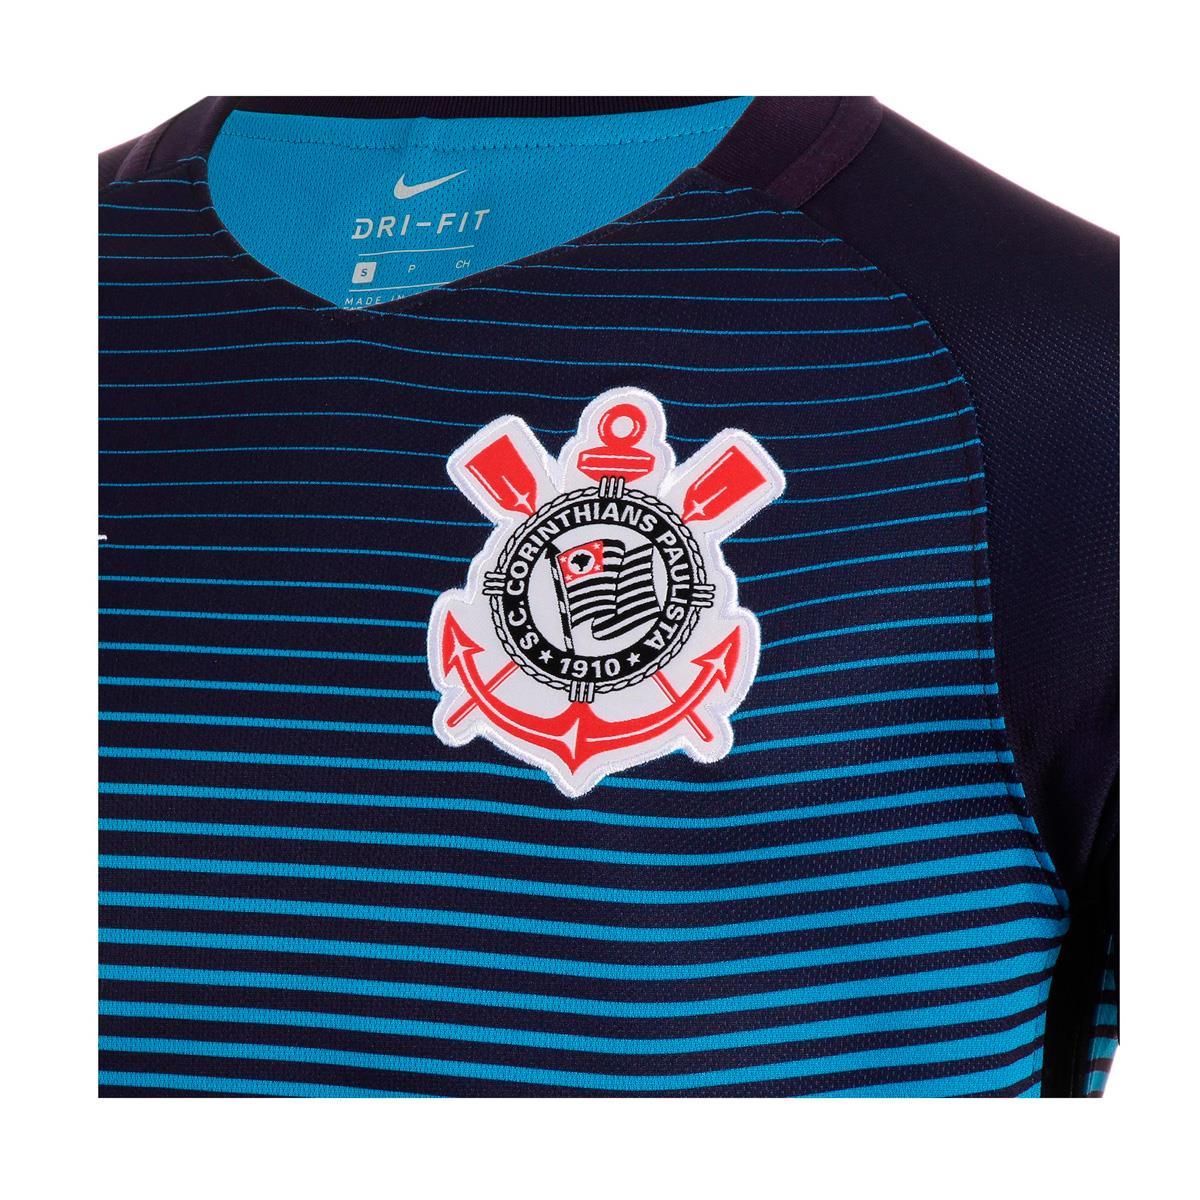 Camisa Nike Corinthians III 2016 2017 Torcedor Masculina c3e9549ff7556